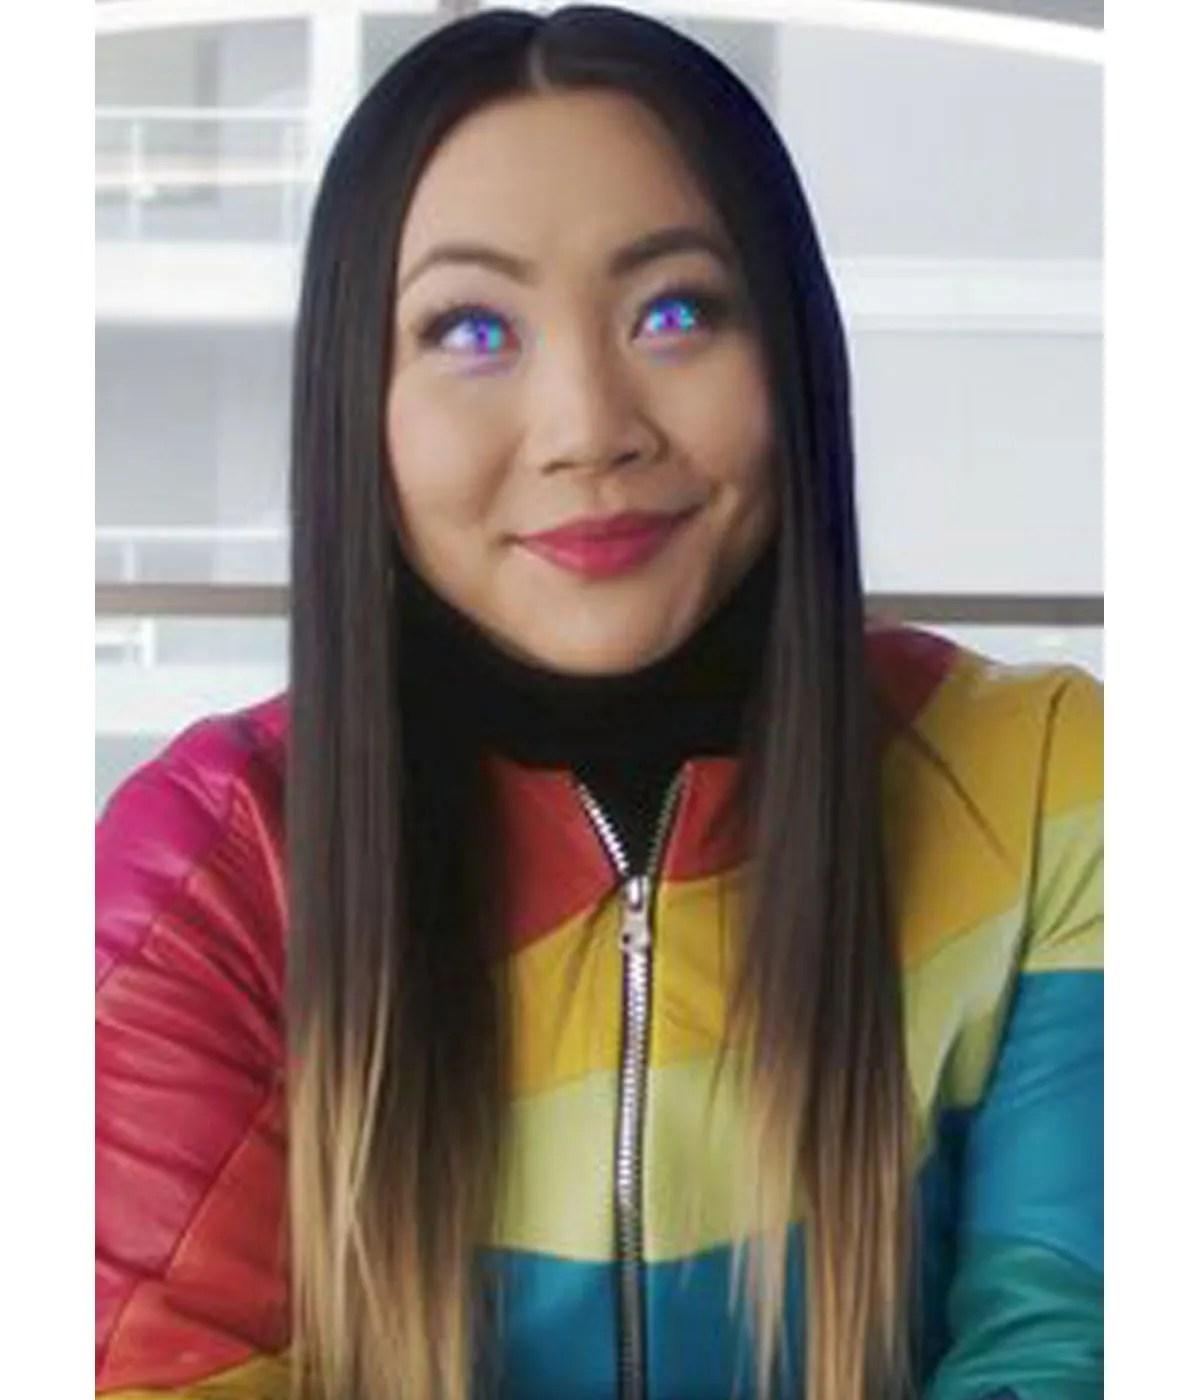 carrie-bates-the-flash-jona-xiao-the-rainbow-raider-jacket